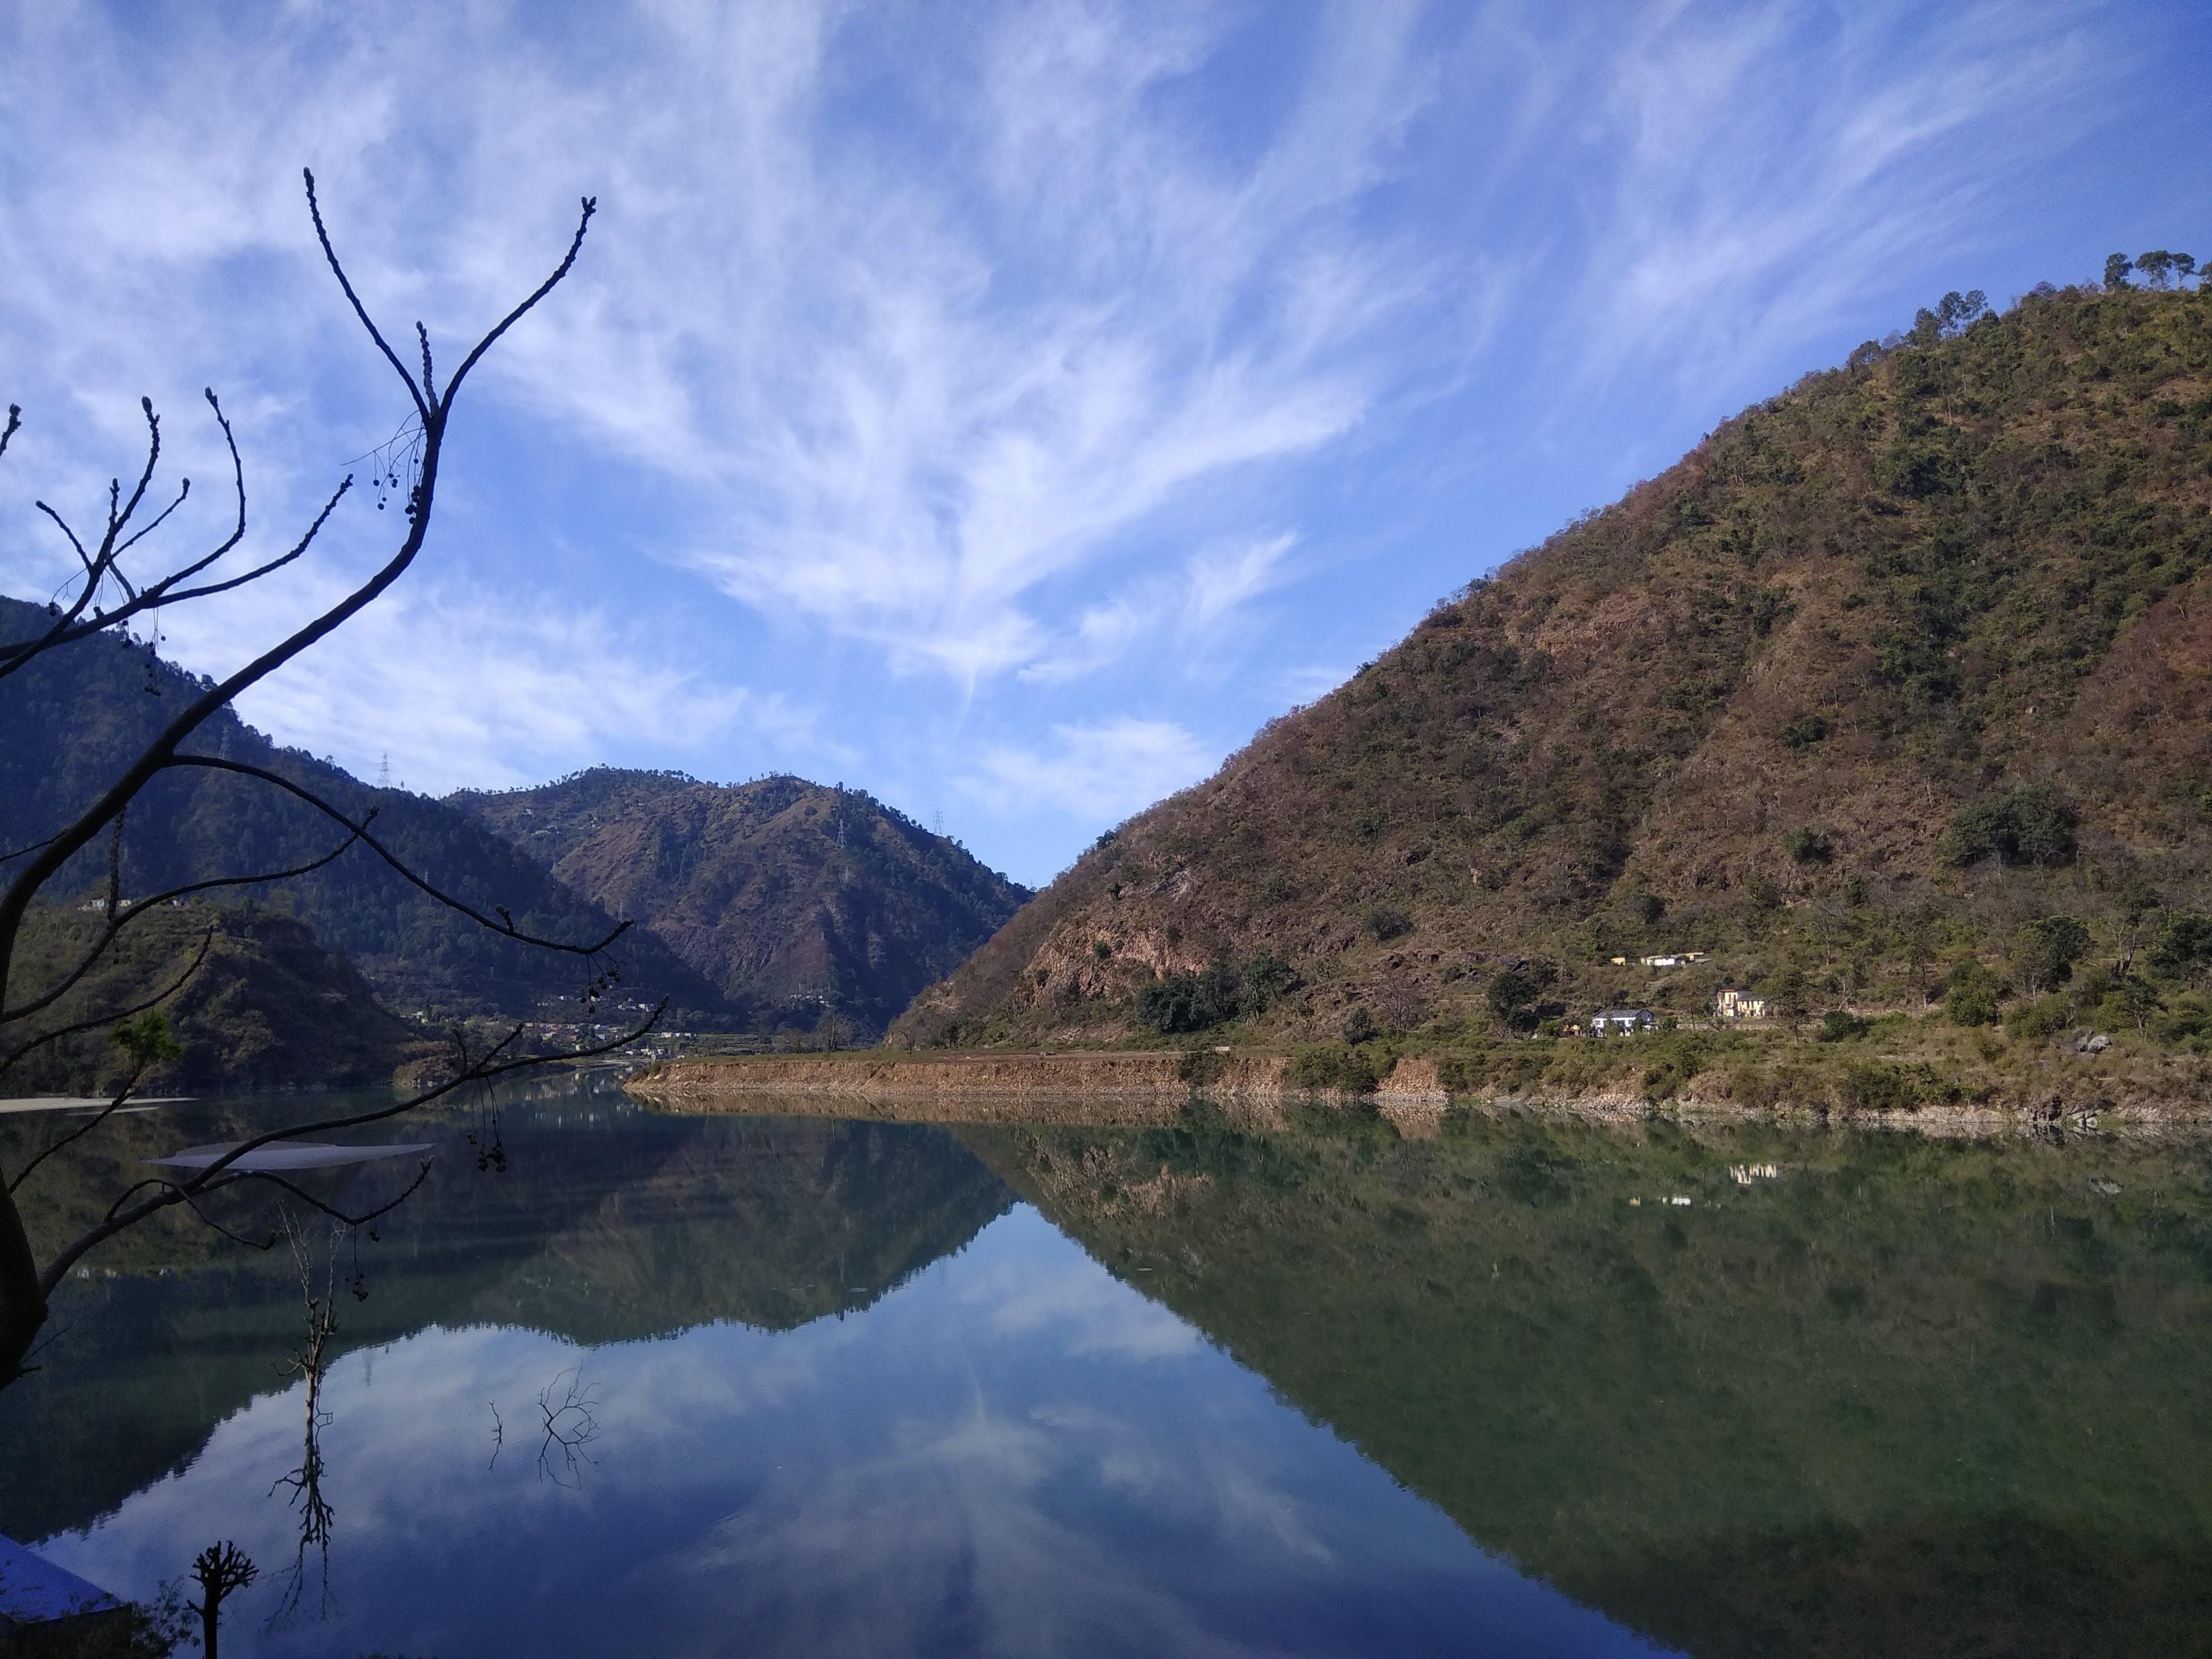 Free stock photo of blue mountains, blue sky, india, riverside